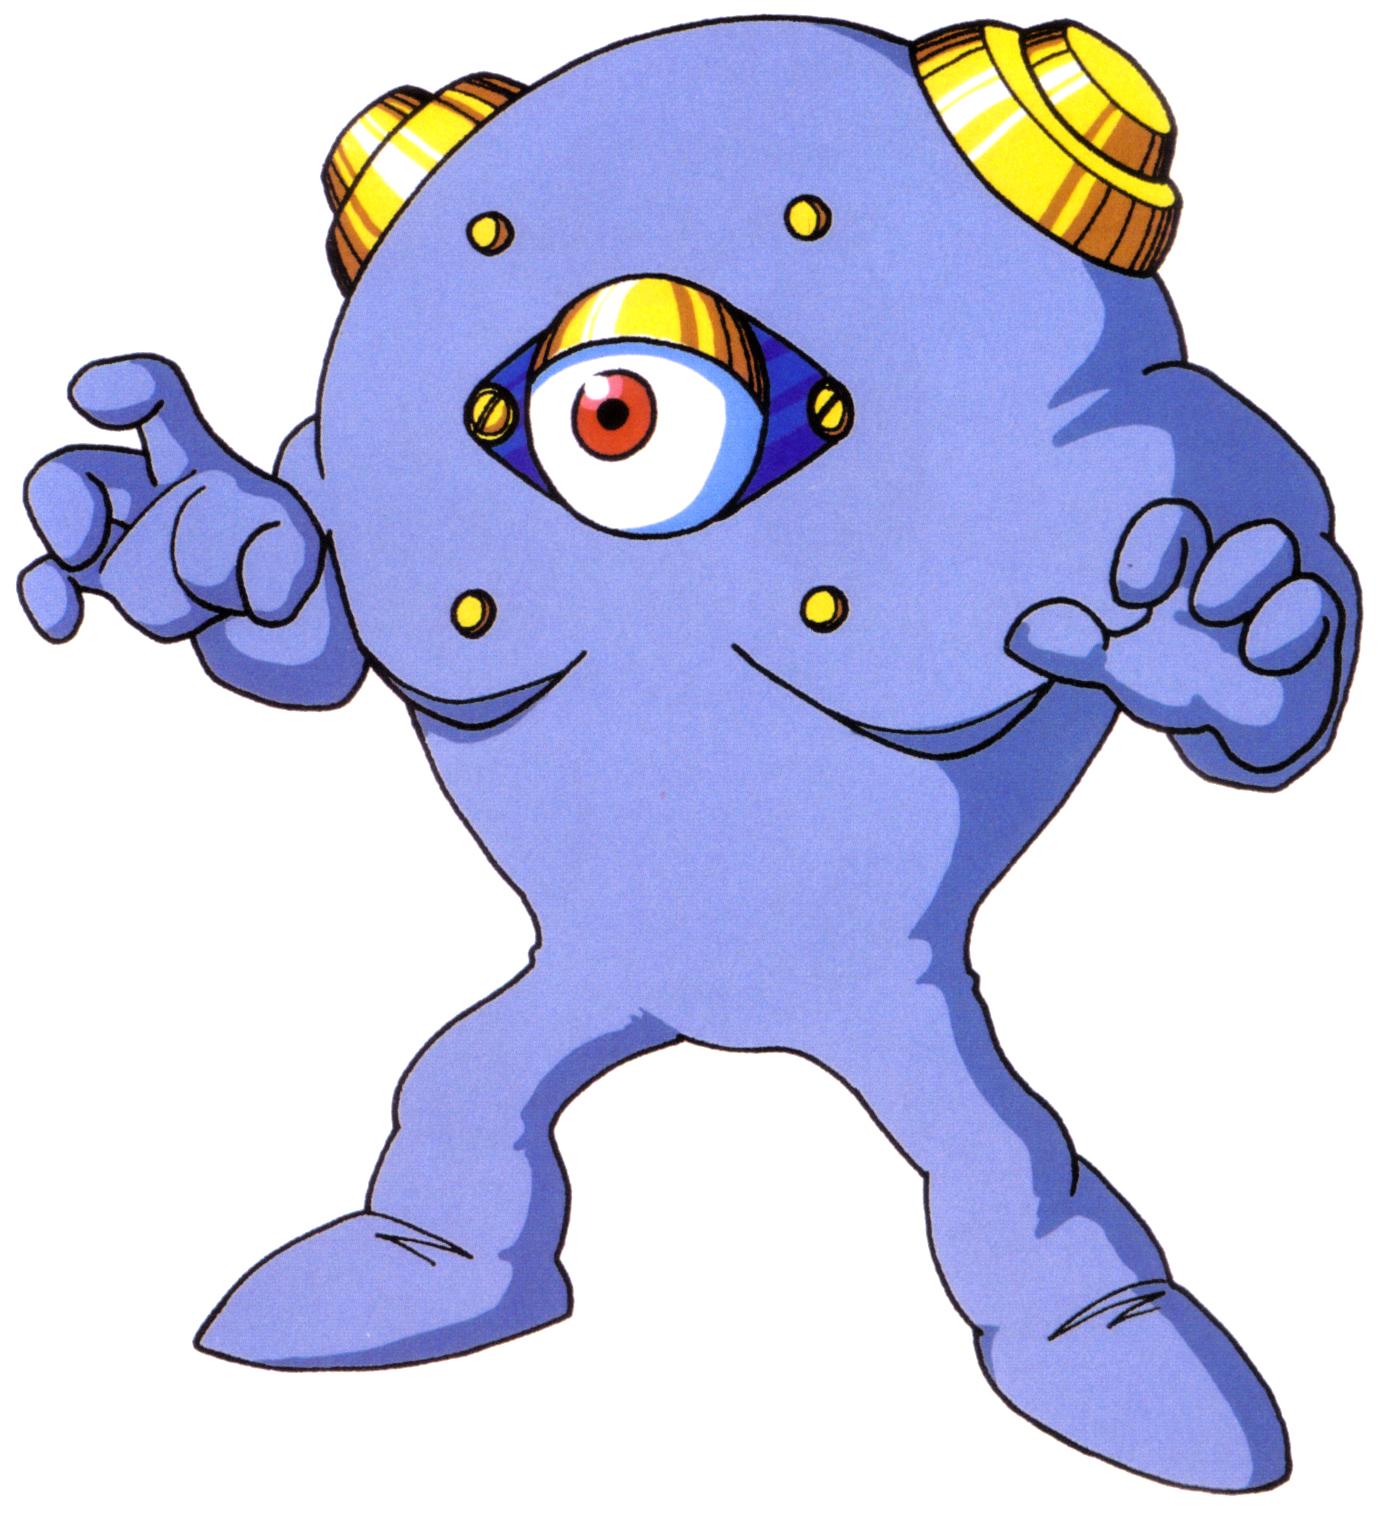 Dark moon mmkb the mega man knowledge base mega man - Megaman wikia ...